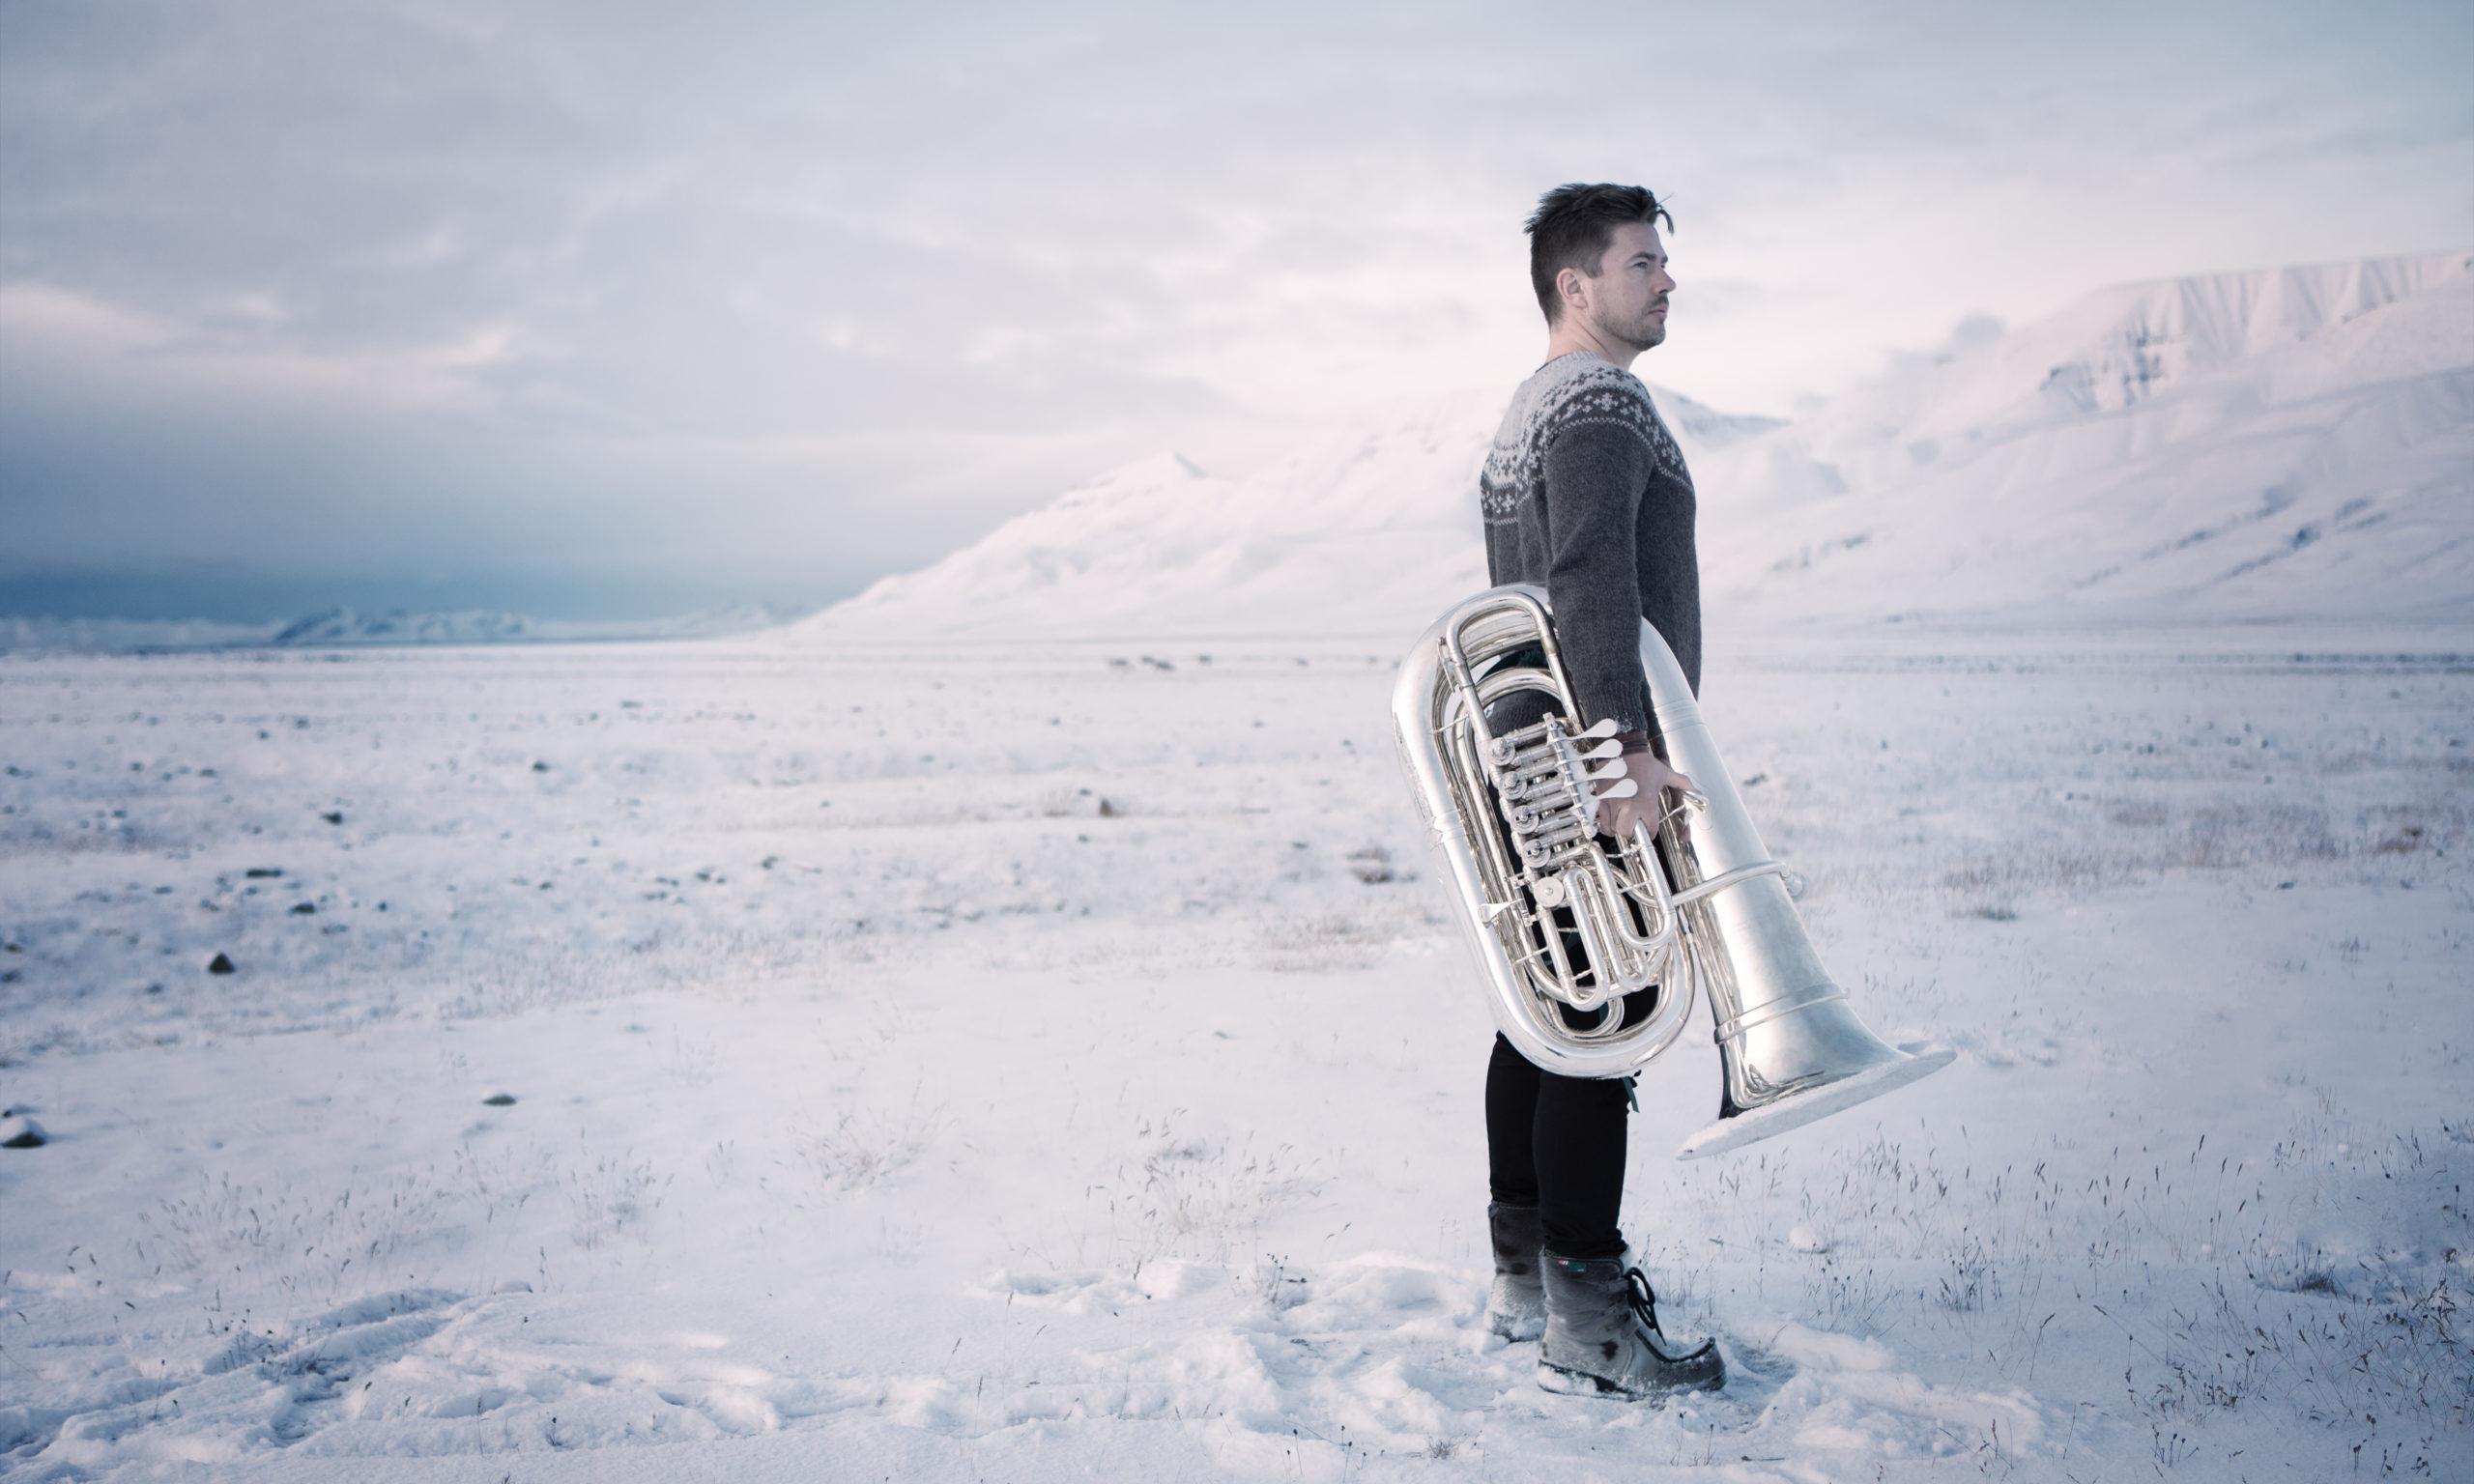 Daniel Herskedal (ダニエル・ヘシュケダール)も Molde Festival 出演_e0081206_7214668.jpg